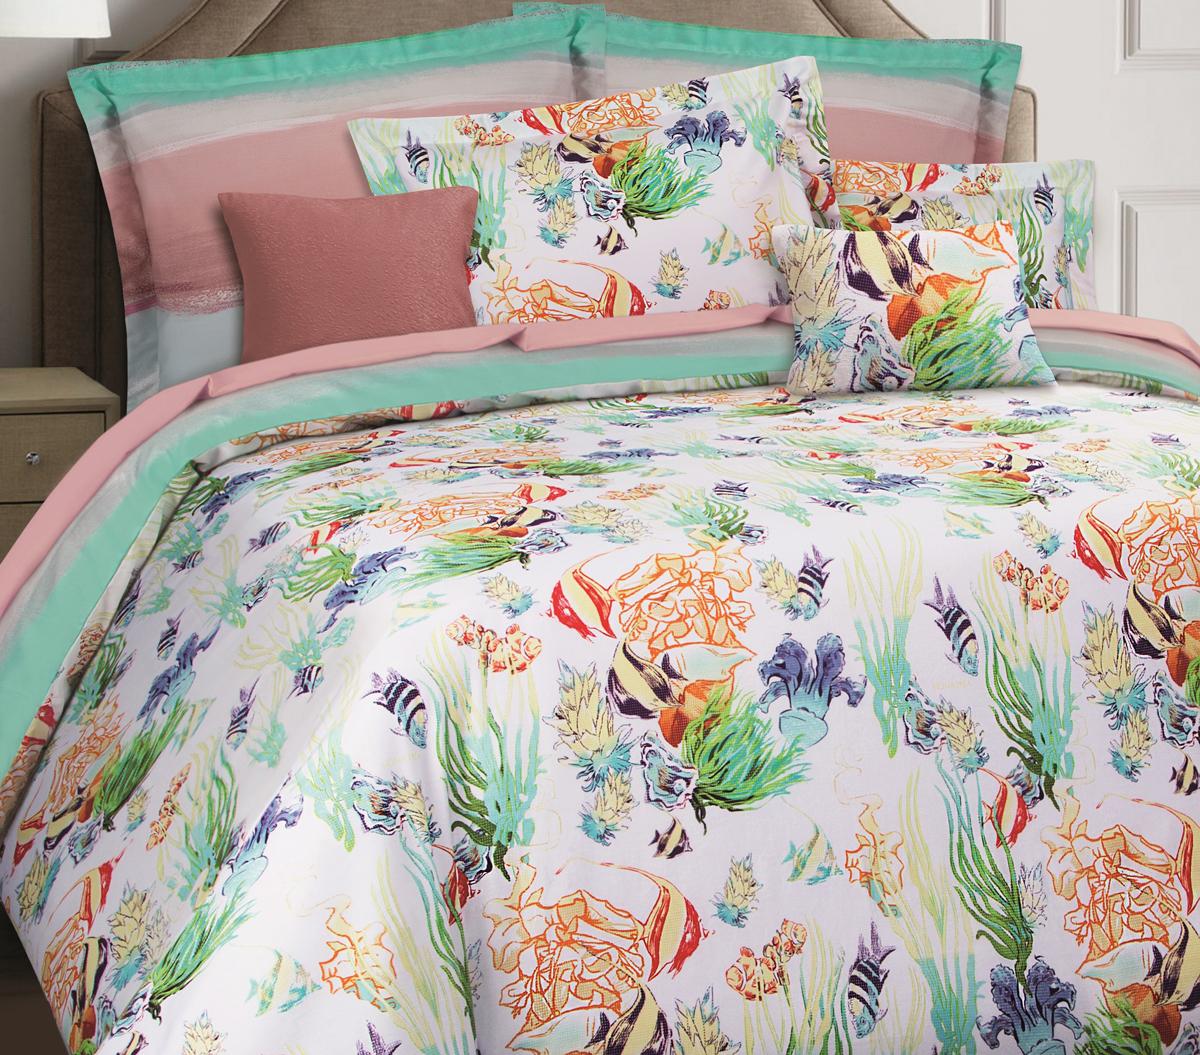 Комплект белья Mona Liza Premium Atelier Sirena, 2-спальный, наволочки 50х70, 70х70. 5044-0013 цена